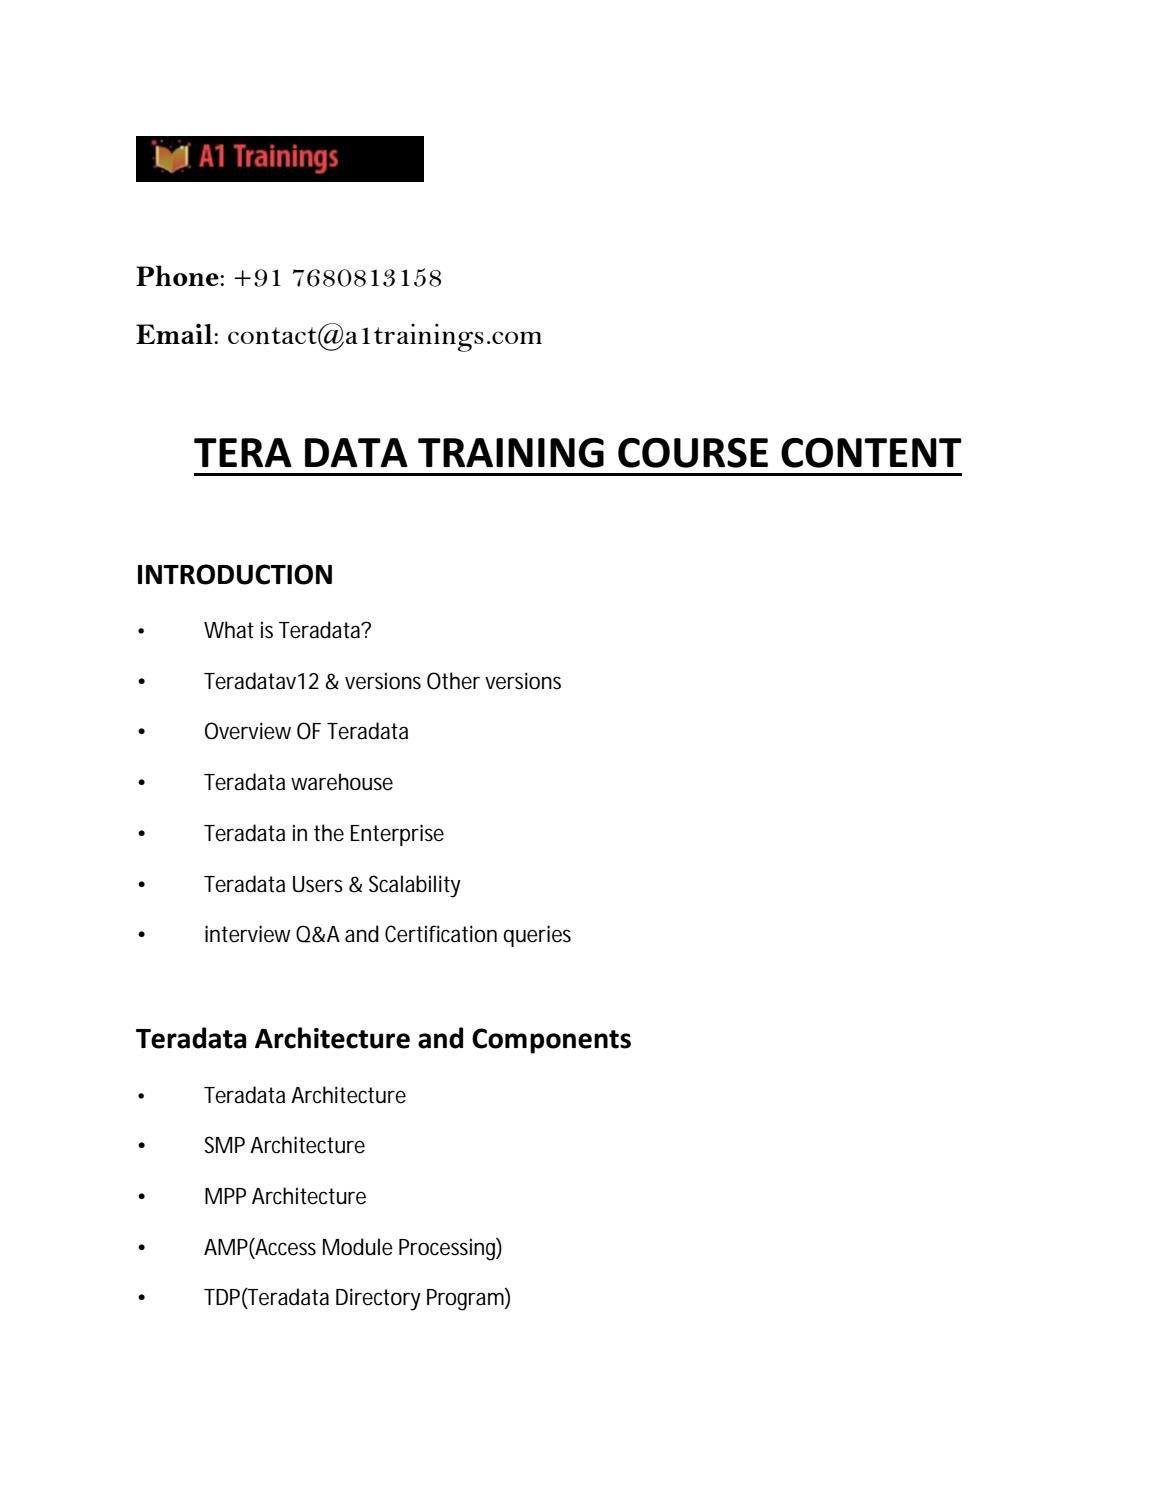 Online Teradata Training Online Teradata Certification Course In